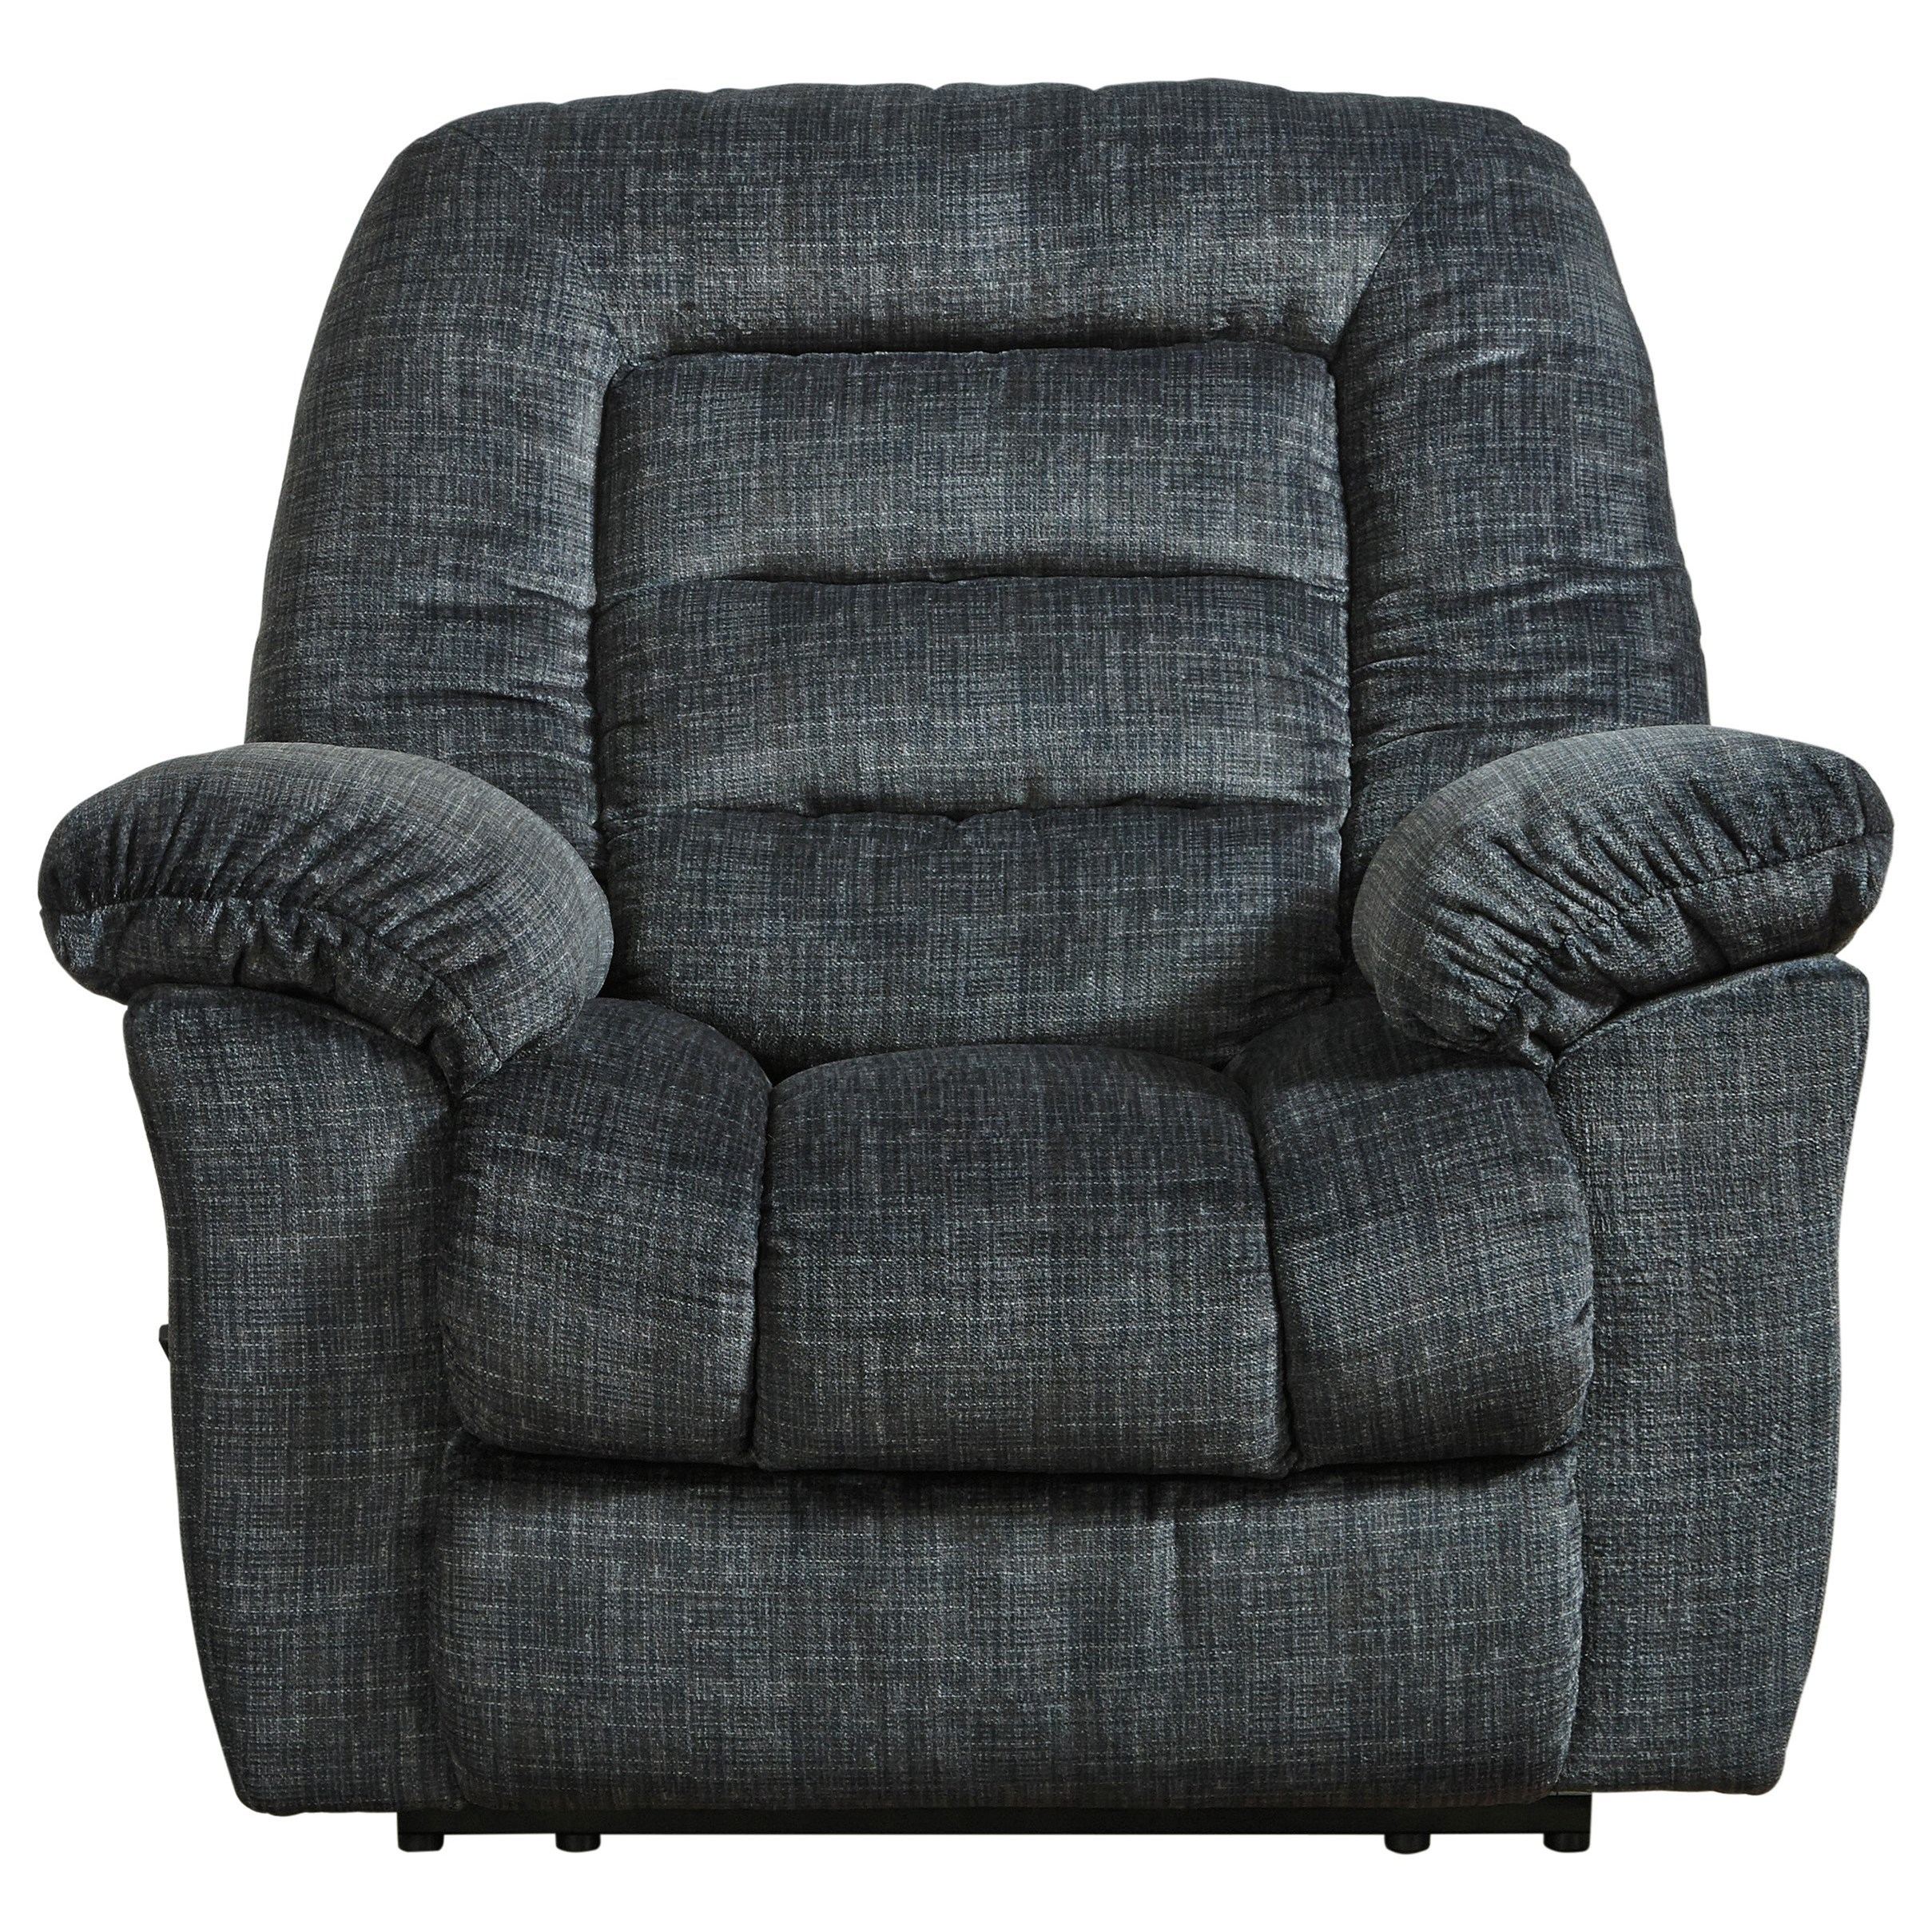 Ashley Furniture Superstore: Signature Design By Ashley Hengen Casual Zero Wall